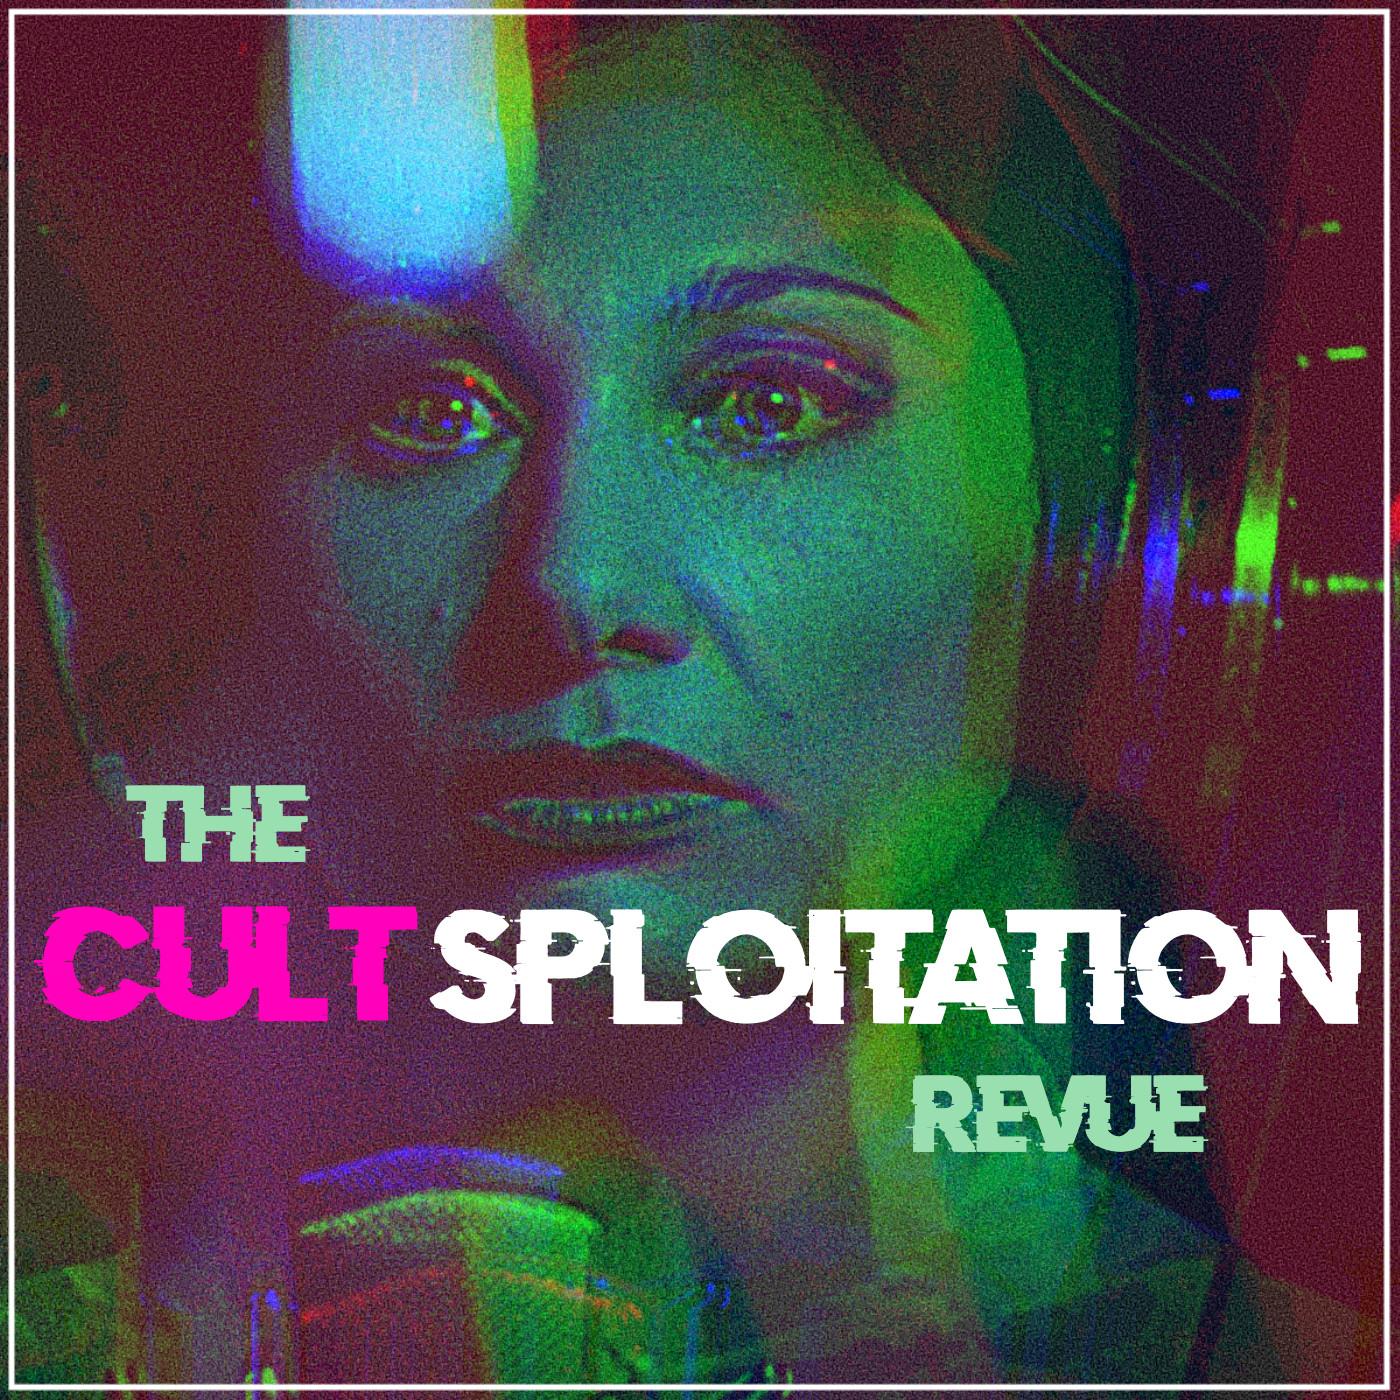 The Cultsploitation Revue